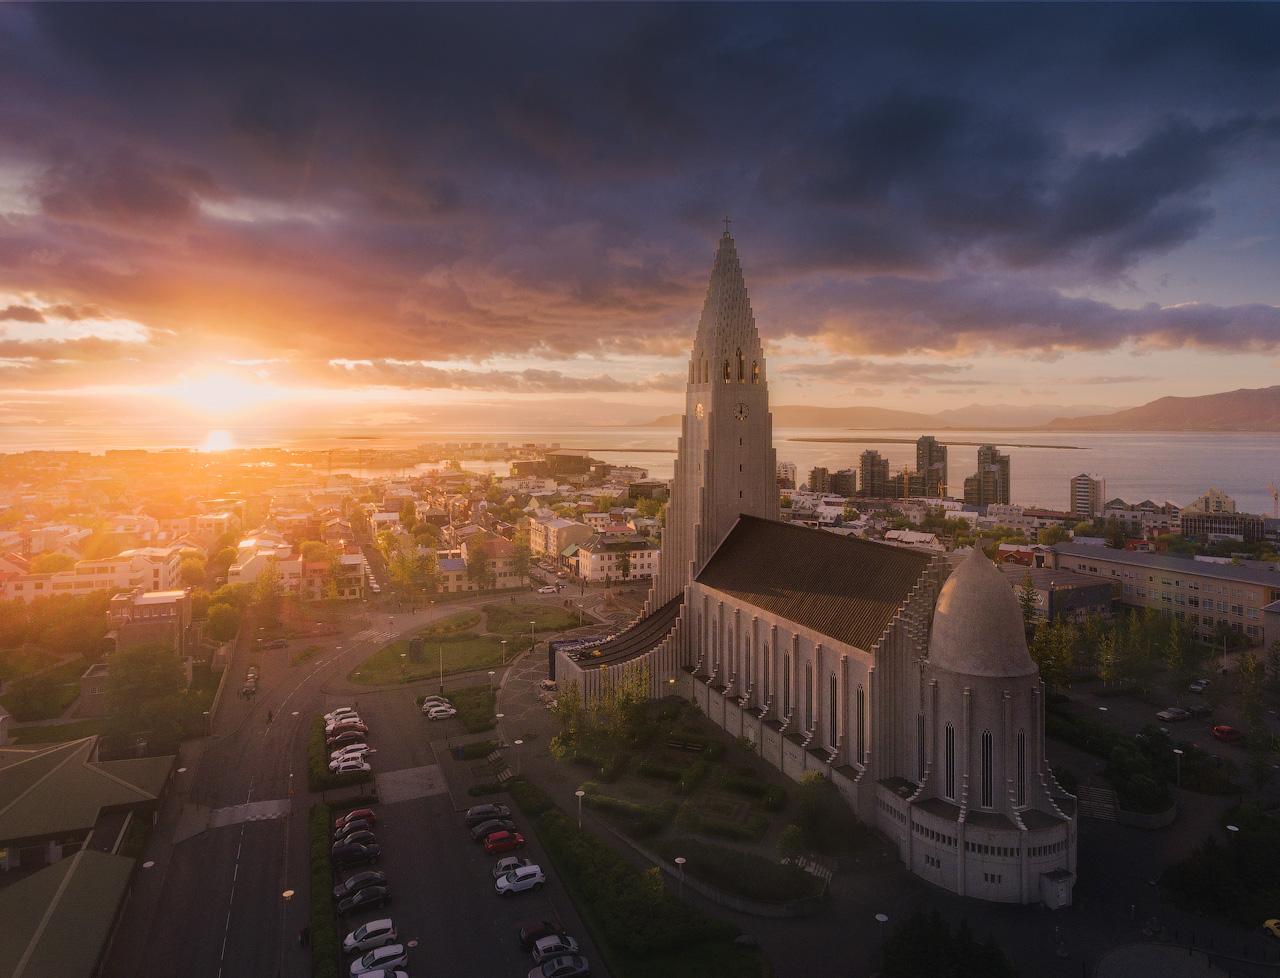 Hallgrímskirkja church is arguably the Icelandic capital's most recognisable landmark.